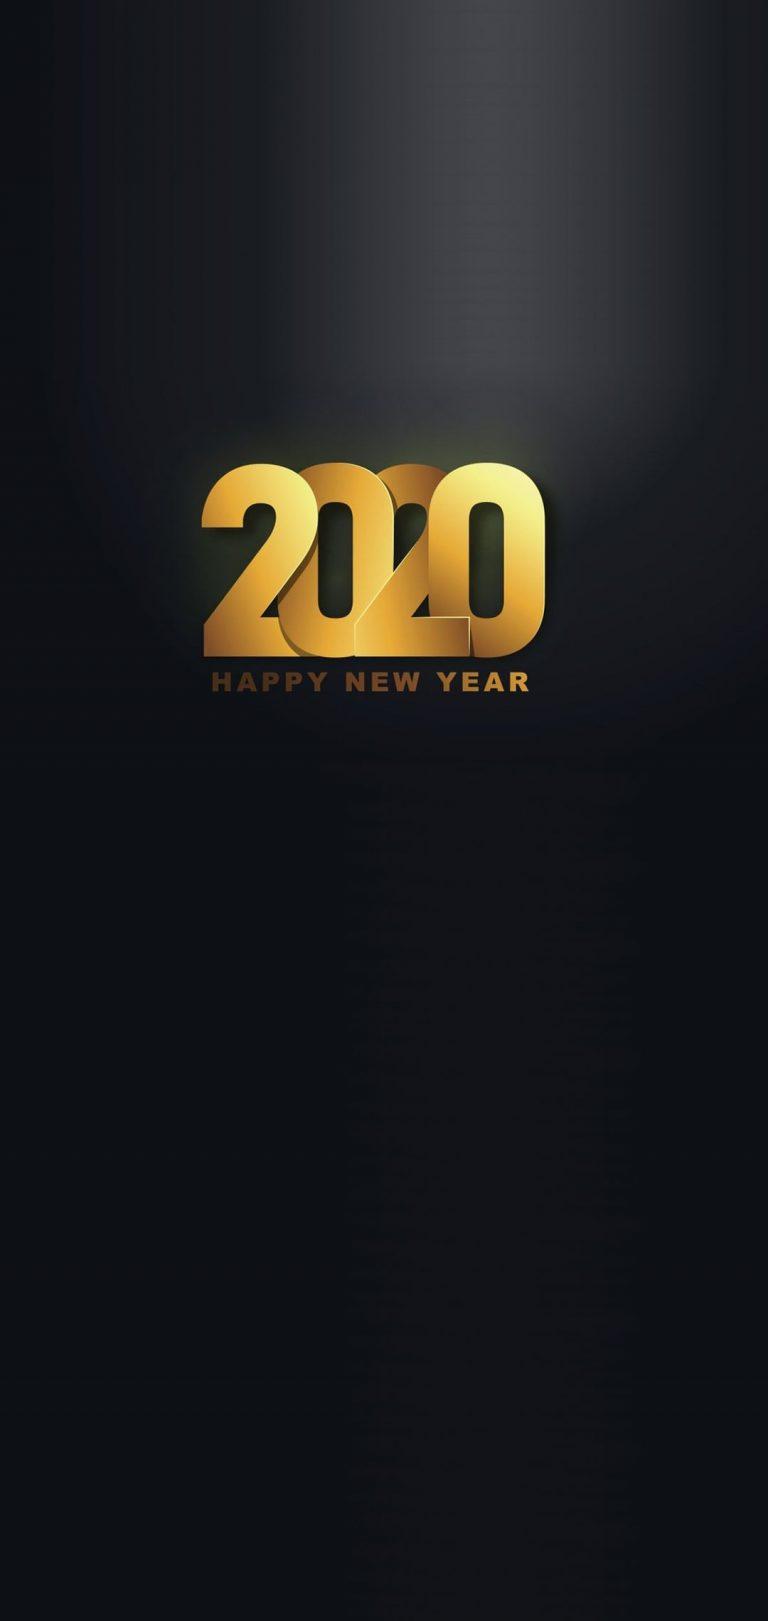 Happy New Year 2020 Phone Wallpaper 17 - [1080x2280]